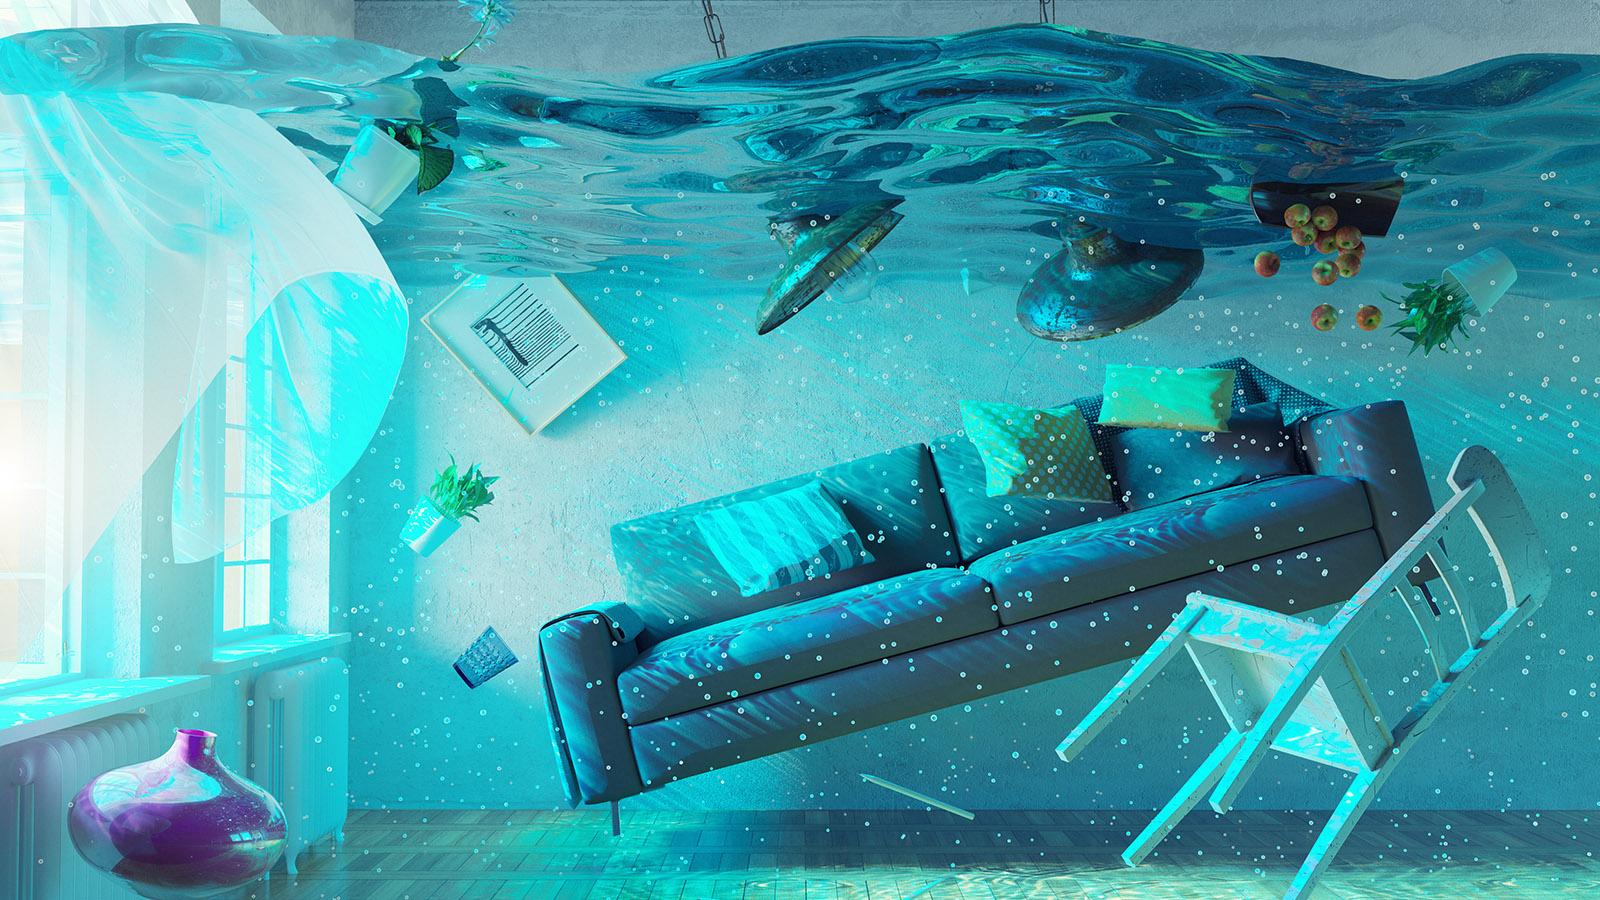 Water Damage Emergency Tips